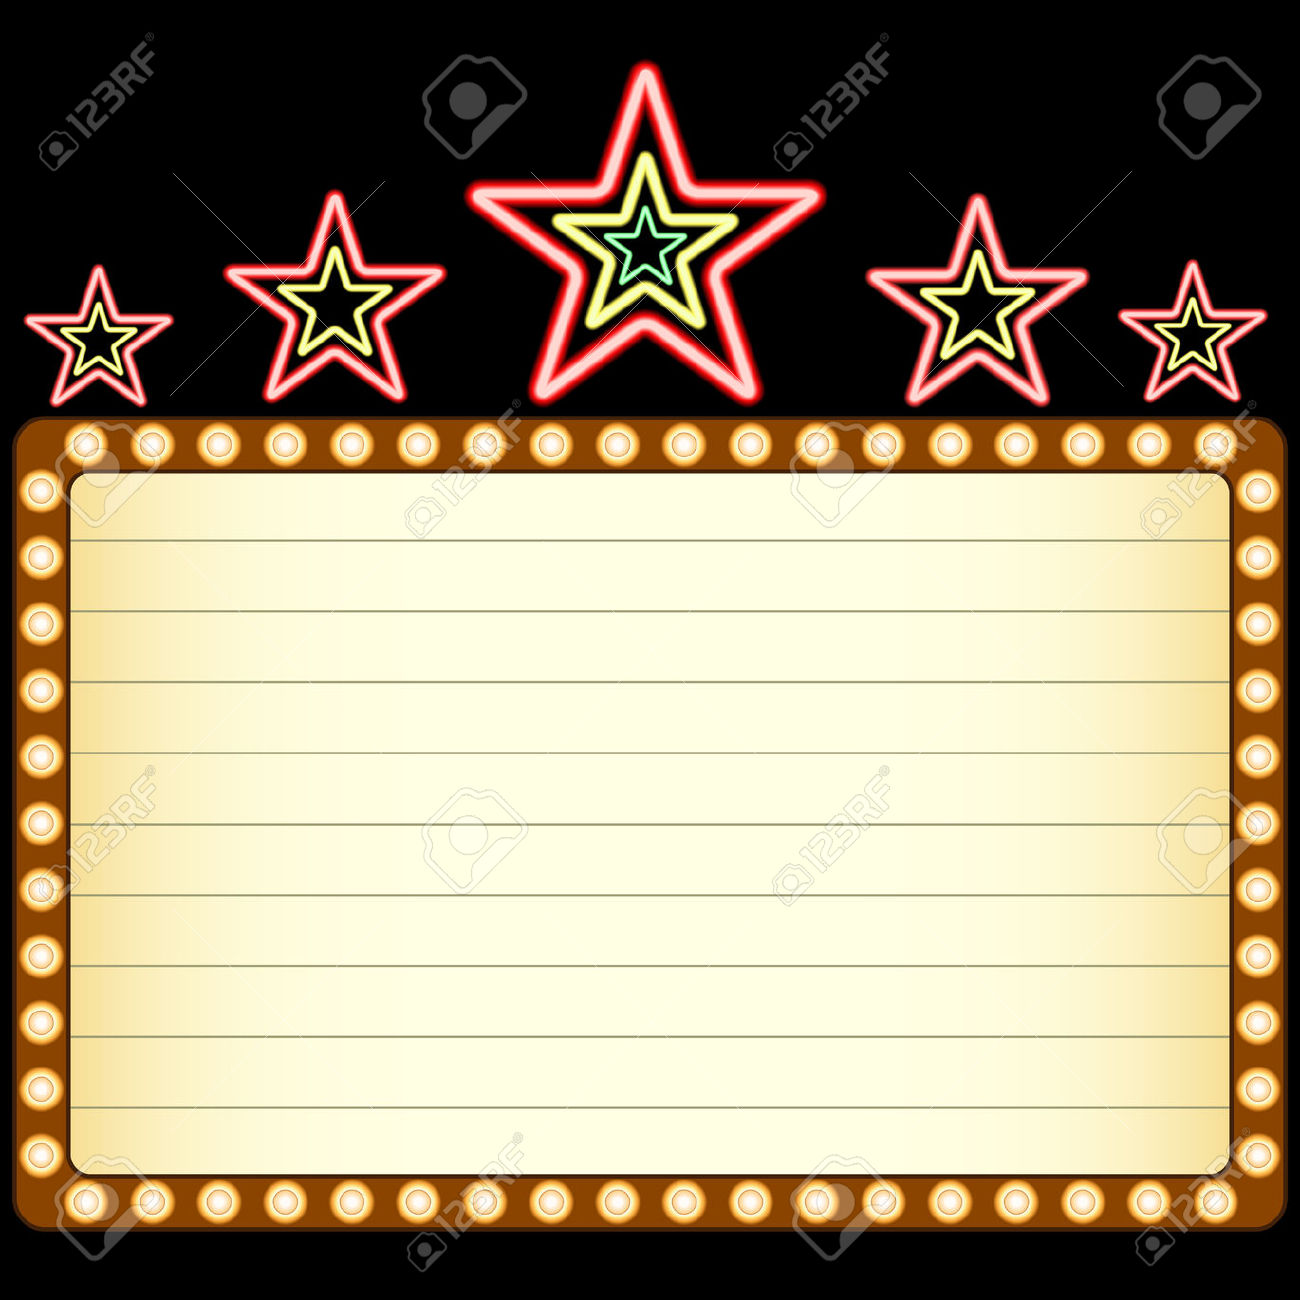 1300x1300 Movie Clipart Blank Movie Marquee